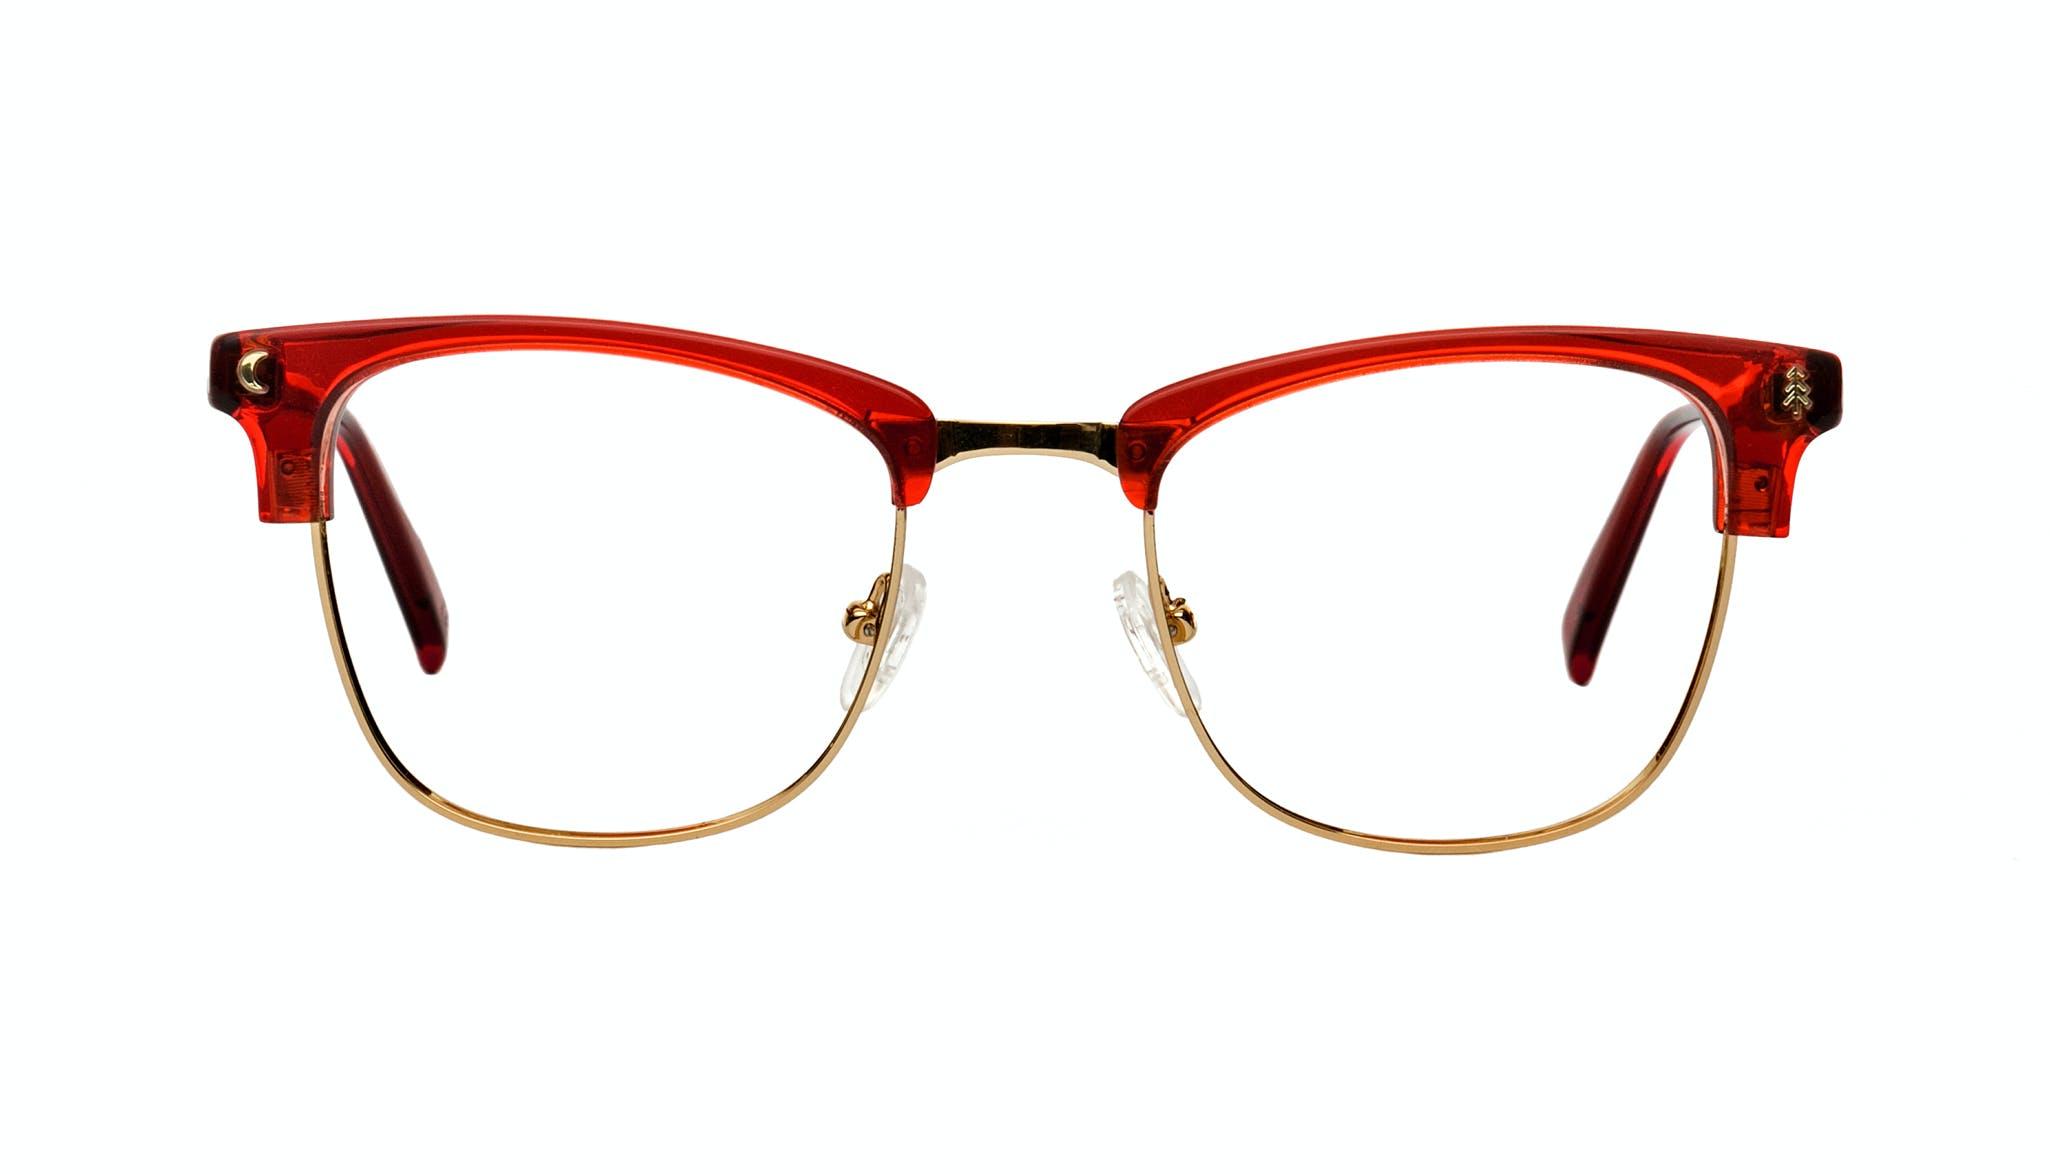 Affordable Fashion Glasses Rectangle Square Eyeglasses Women Stargazer Kindled Red Front